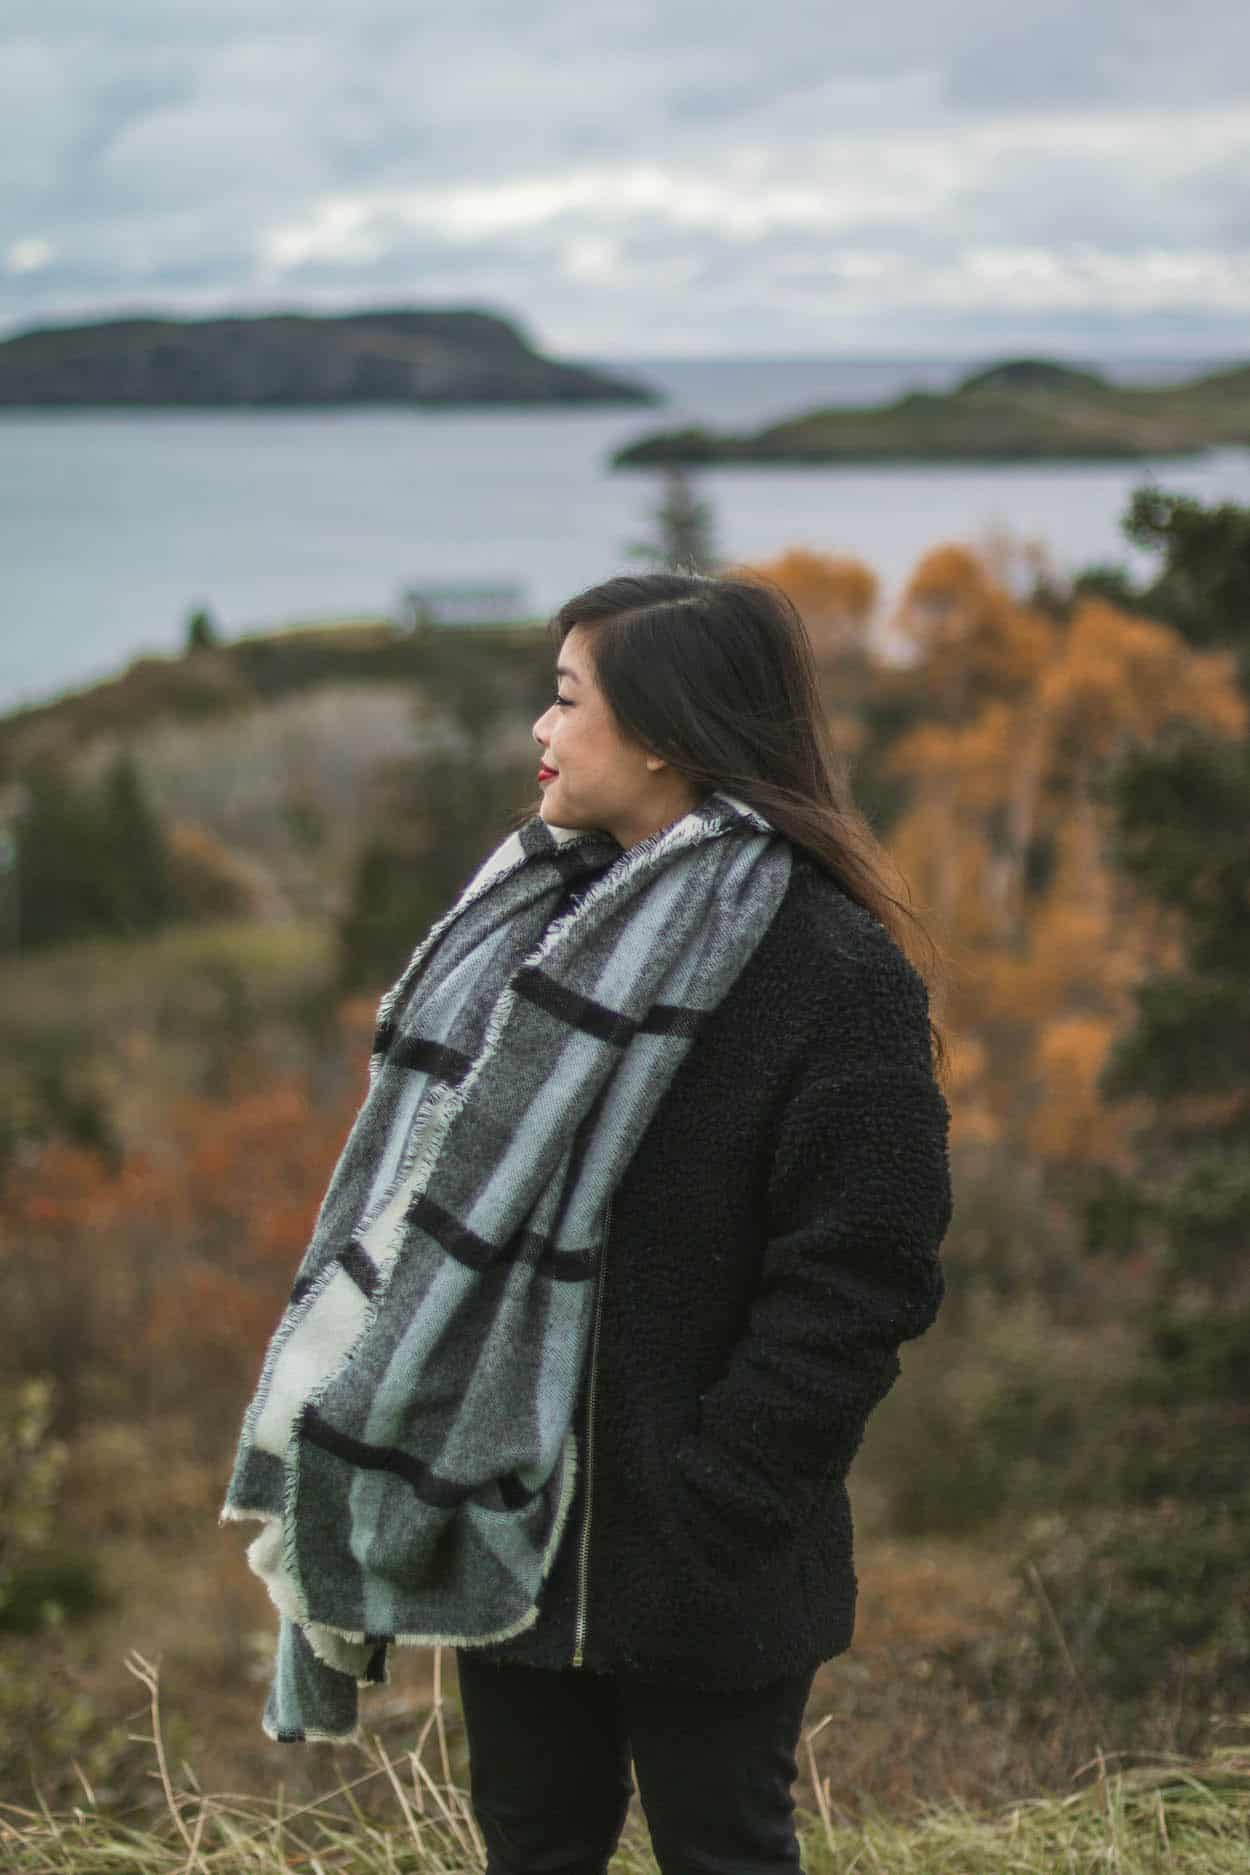 Tors Cove along the Irish Loop drive in St. John's, Newfoundland